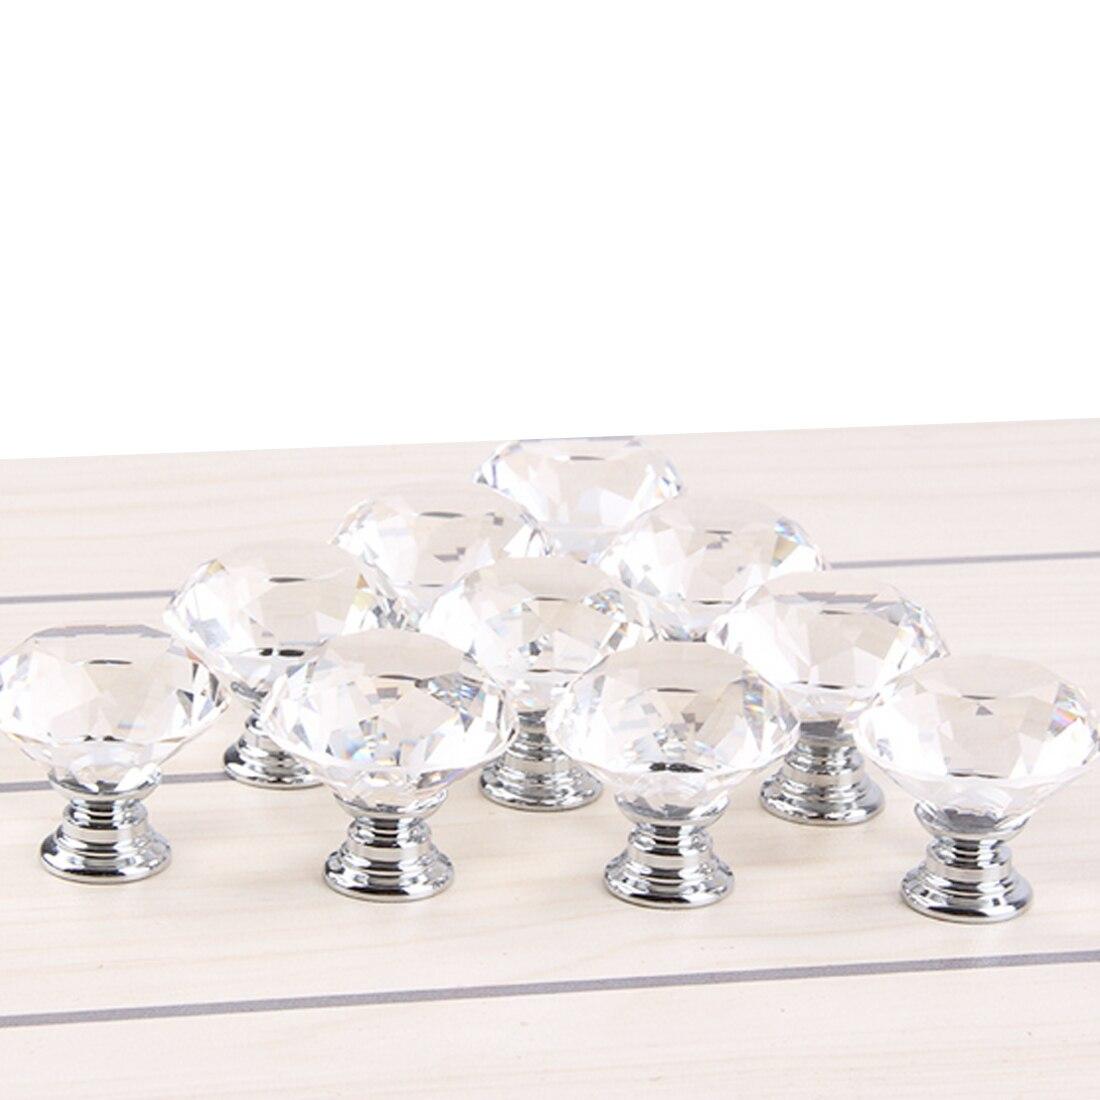 New 10 Pcs 30mm Diamond Shape Crystal Glass Door Handle Knob for furniture Drawer Cabinet Kitchen Pull Handles Knobs Wardrobe недорго, оригинальная цена